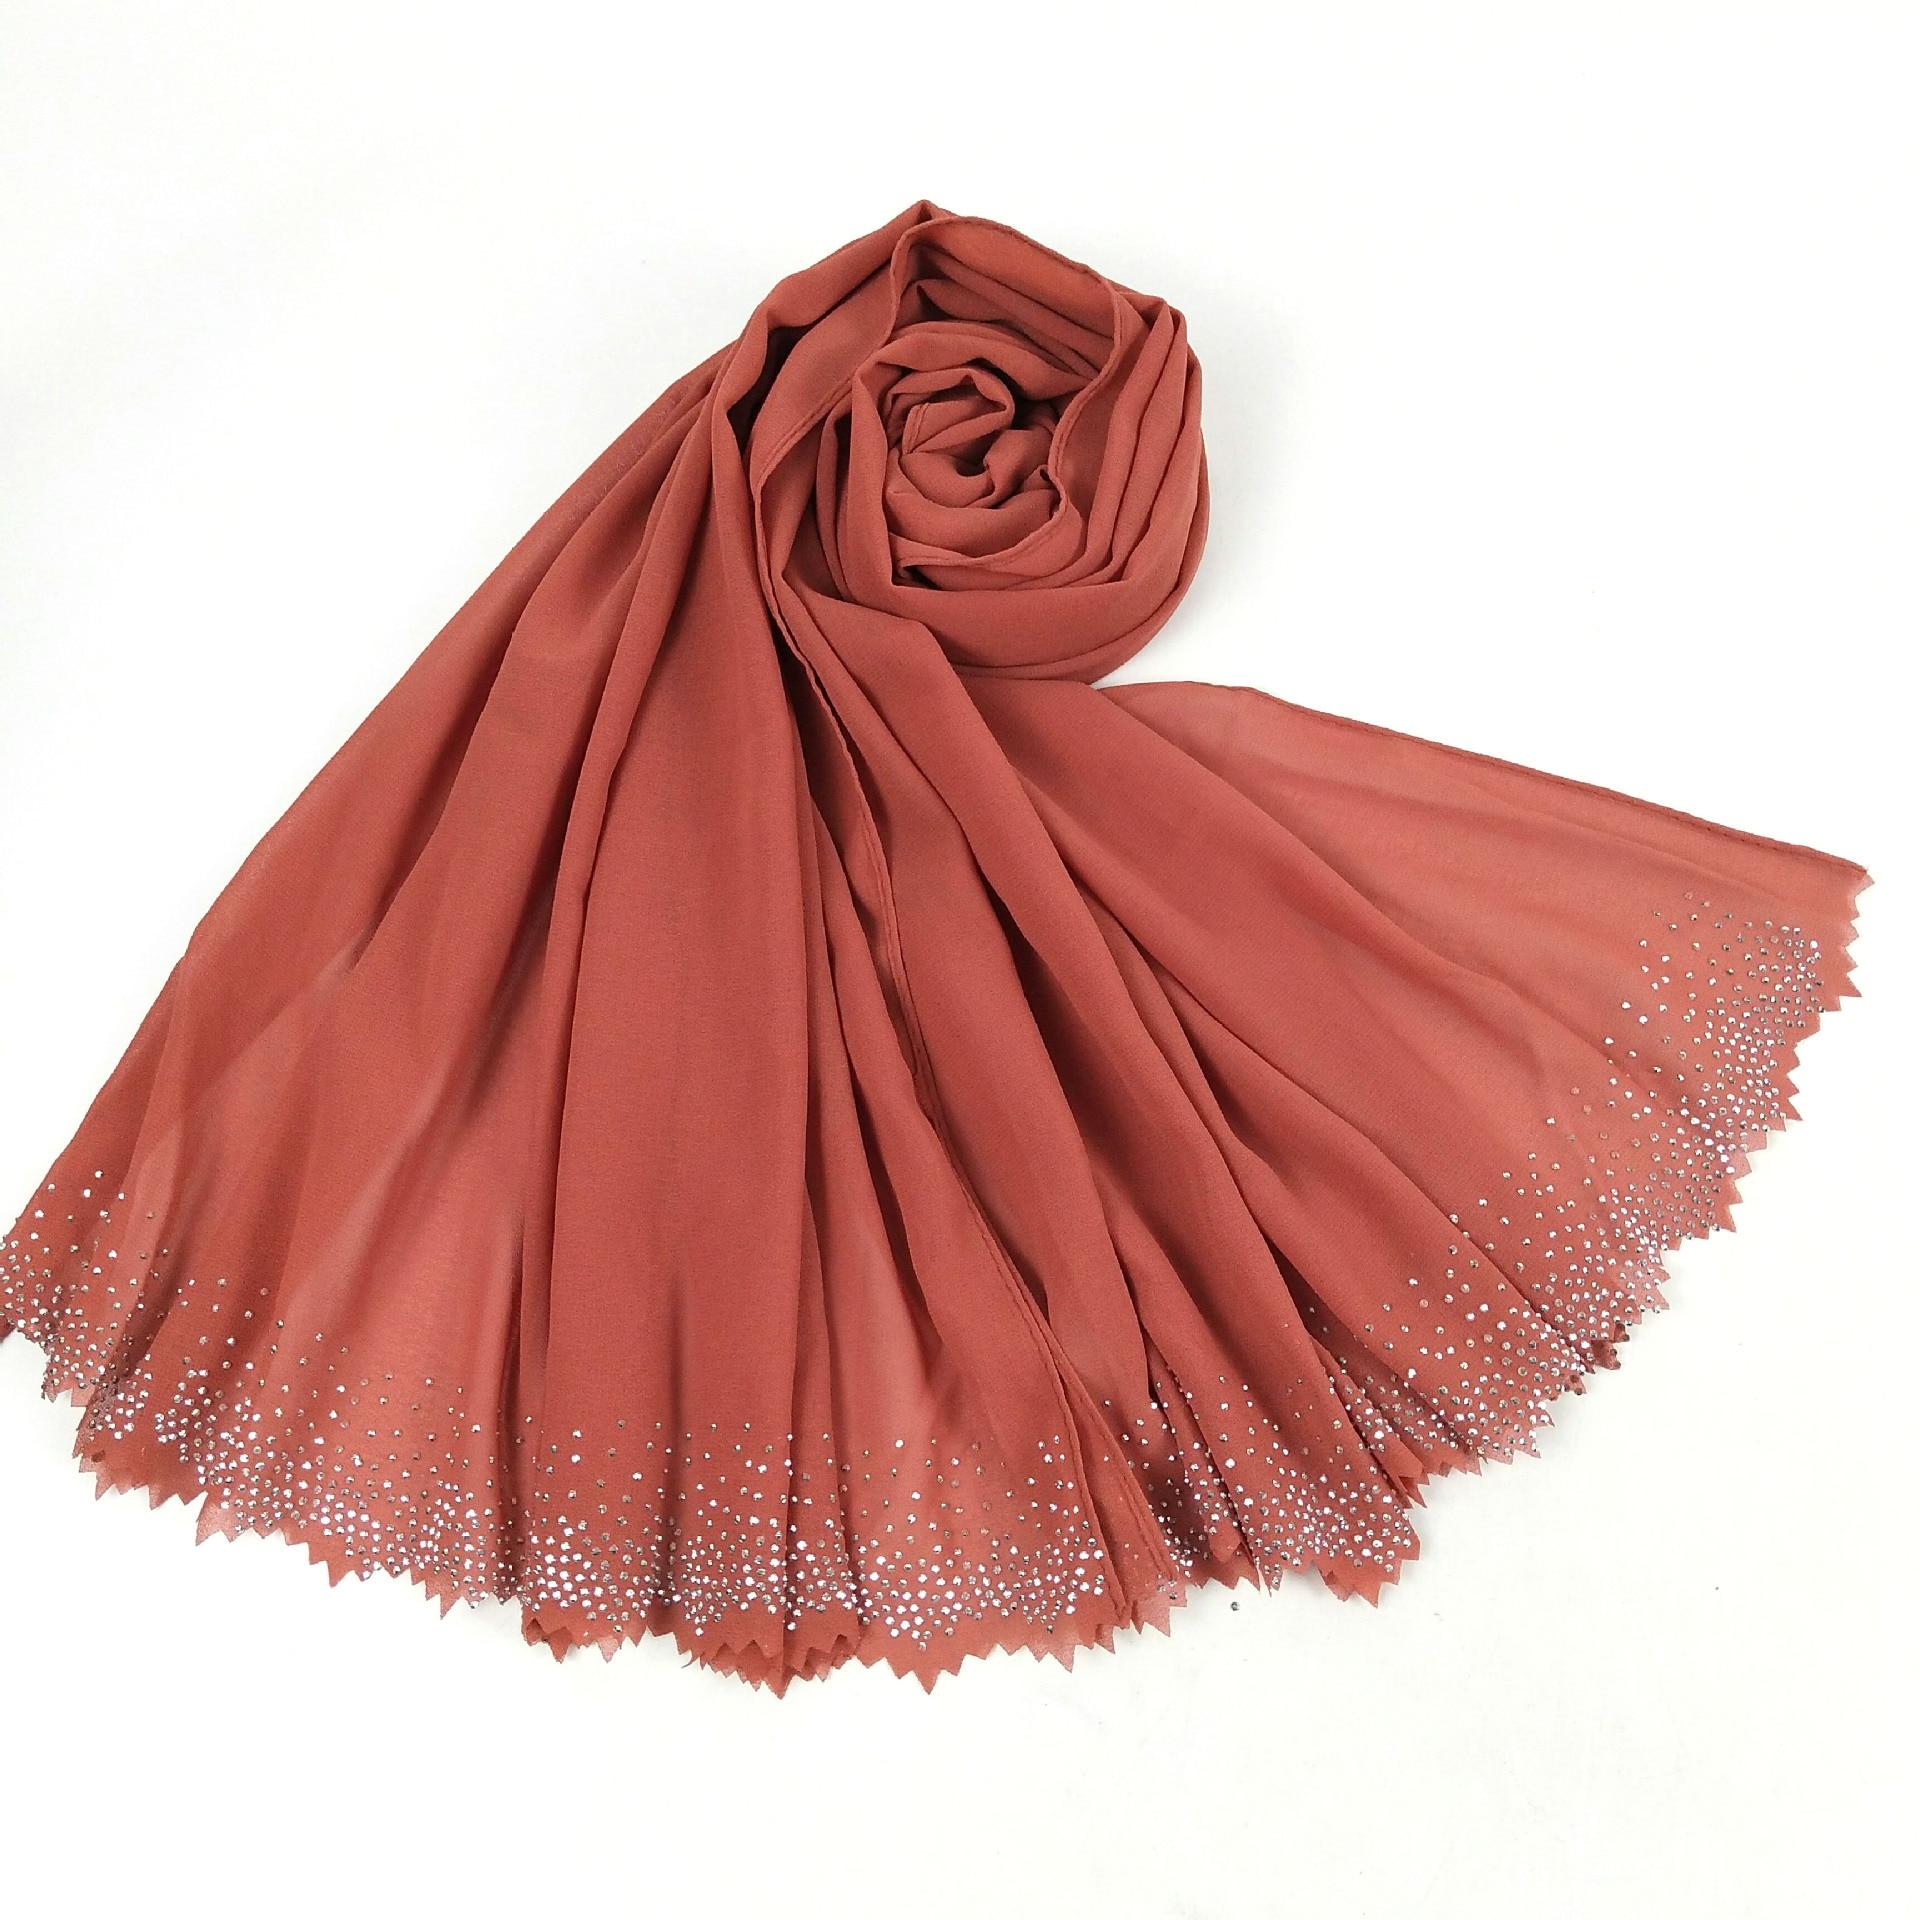 Image 5 - New Hollow Hot Diamond Pearl Chiffon Headscarf Muslim Hijab Long Towel Malaysian ShawlIslamic Clothing